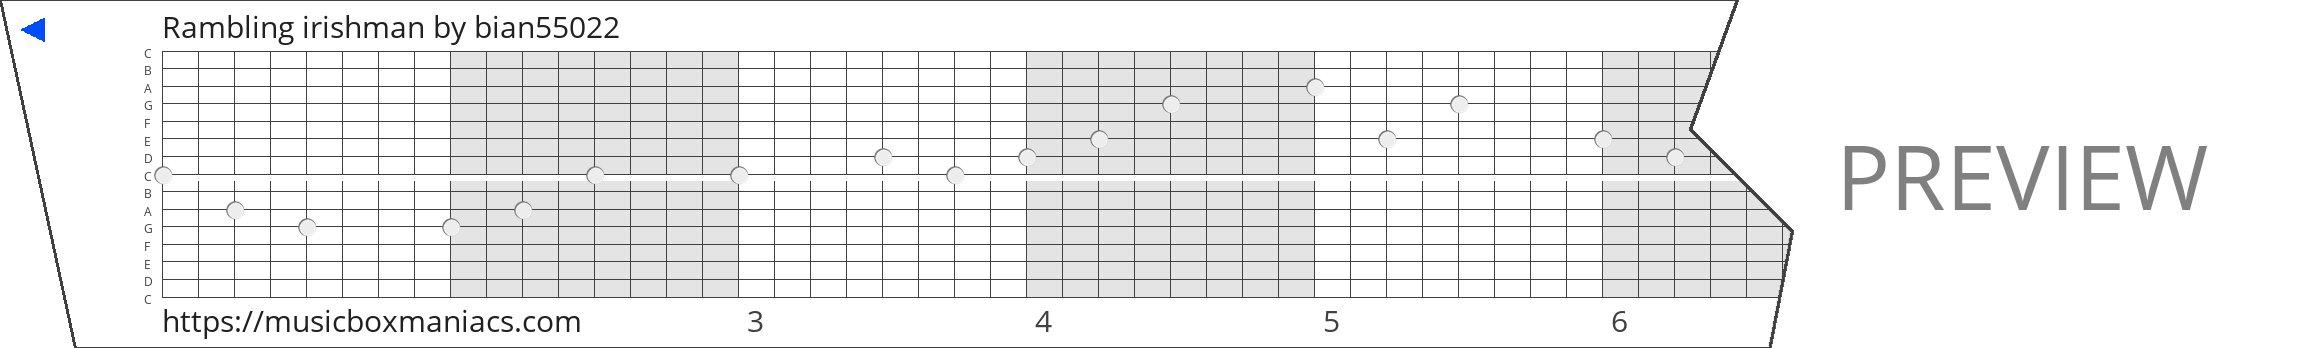 Rambling irishman 15 note music box paper strip